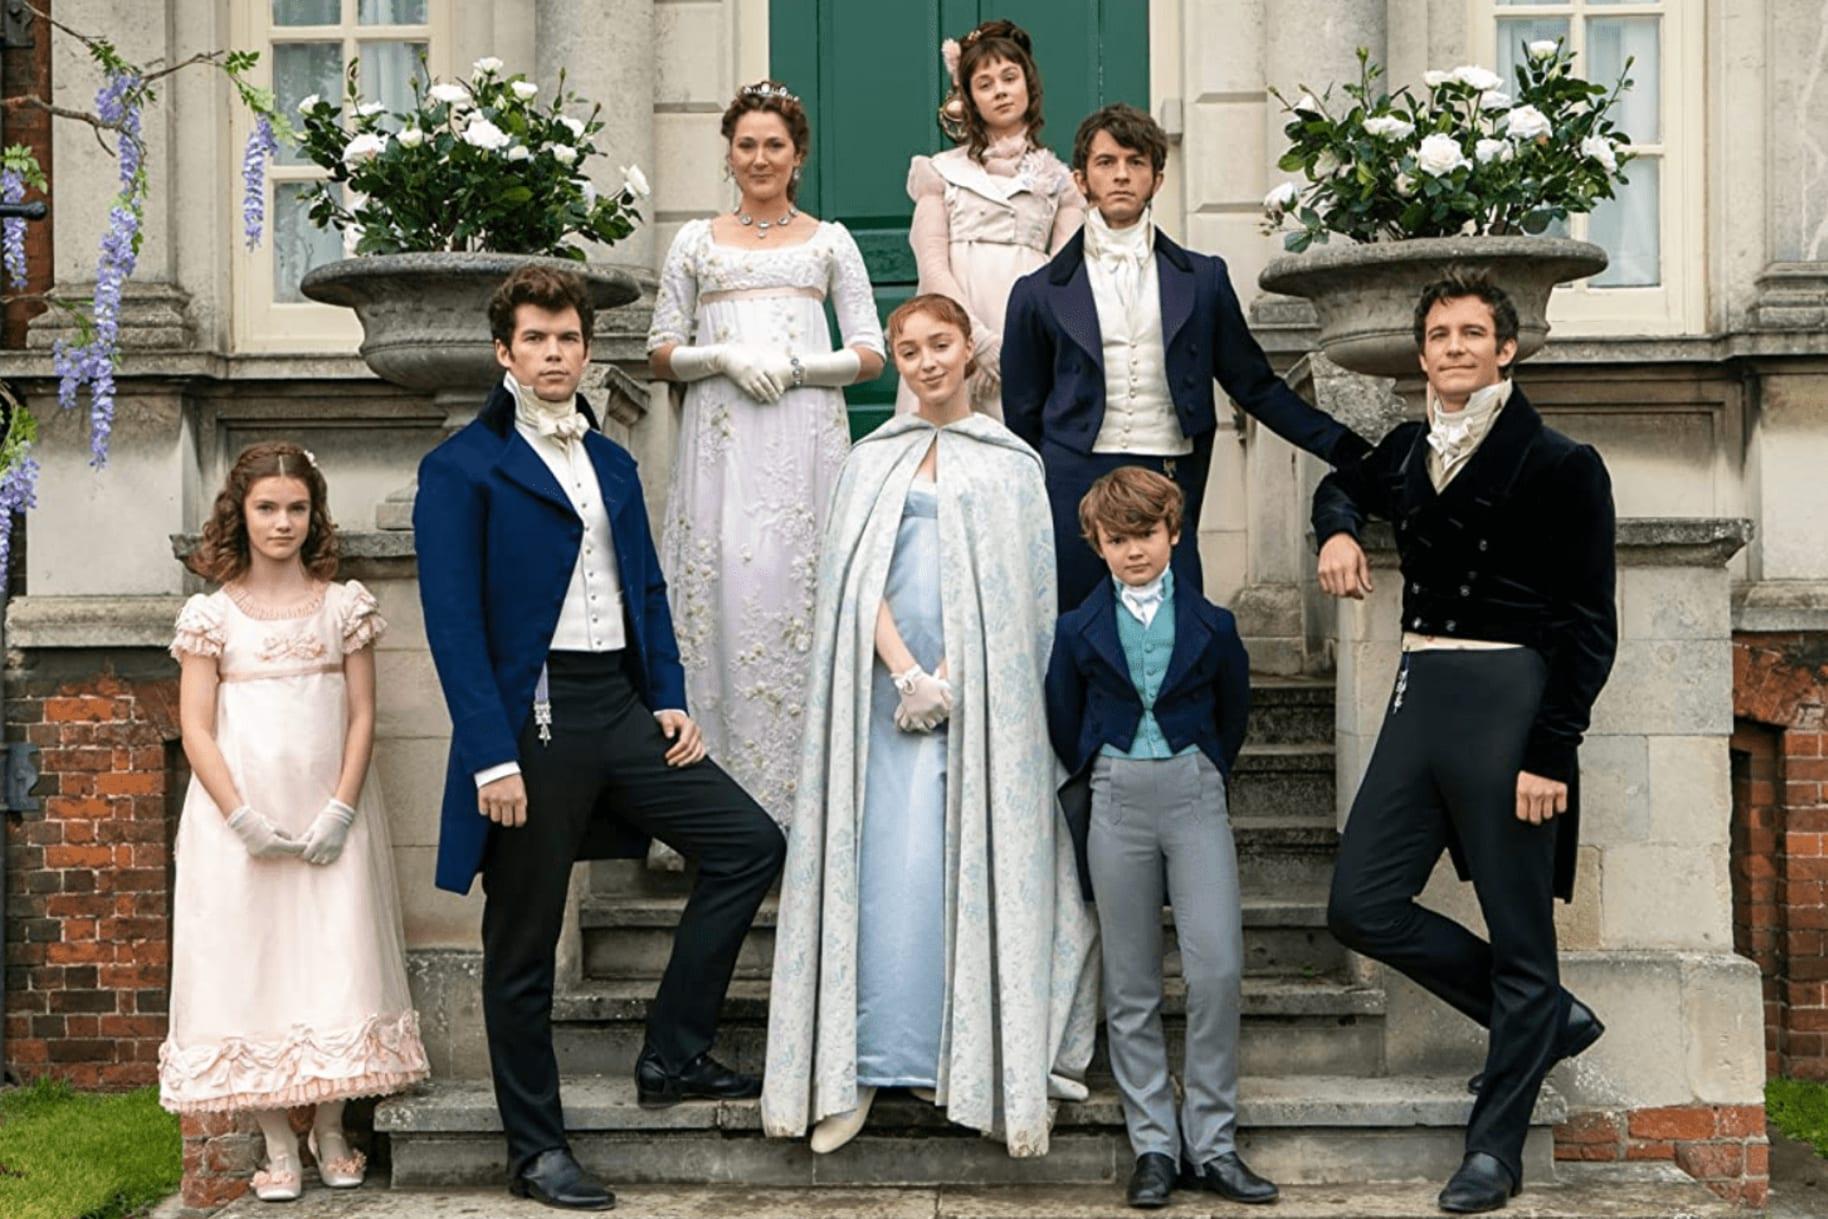 Die Bridgerton-Familie